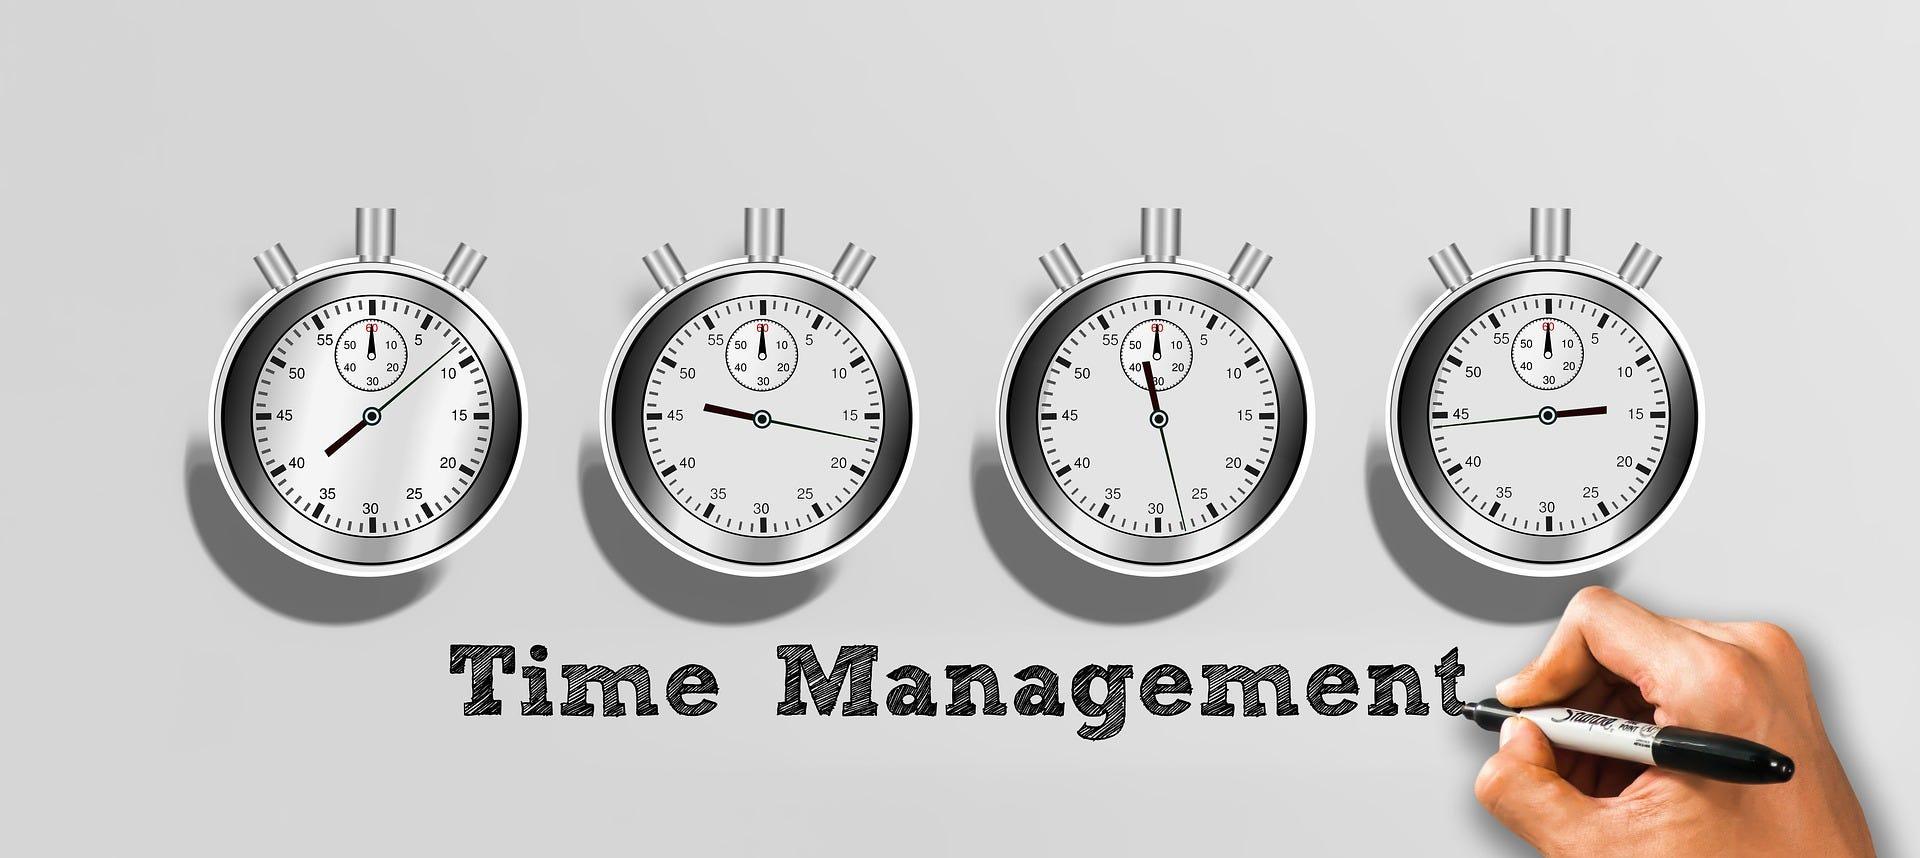 9 Super Easy Time Management Tips For Entrepreneurs To